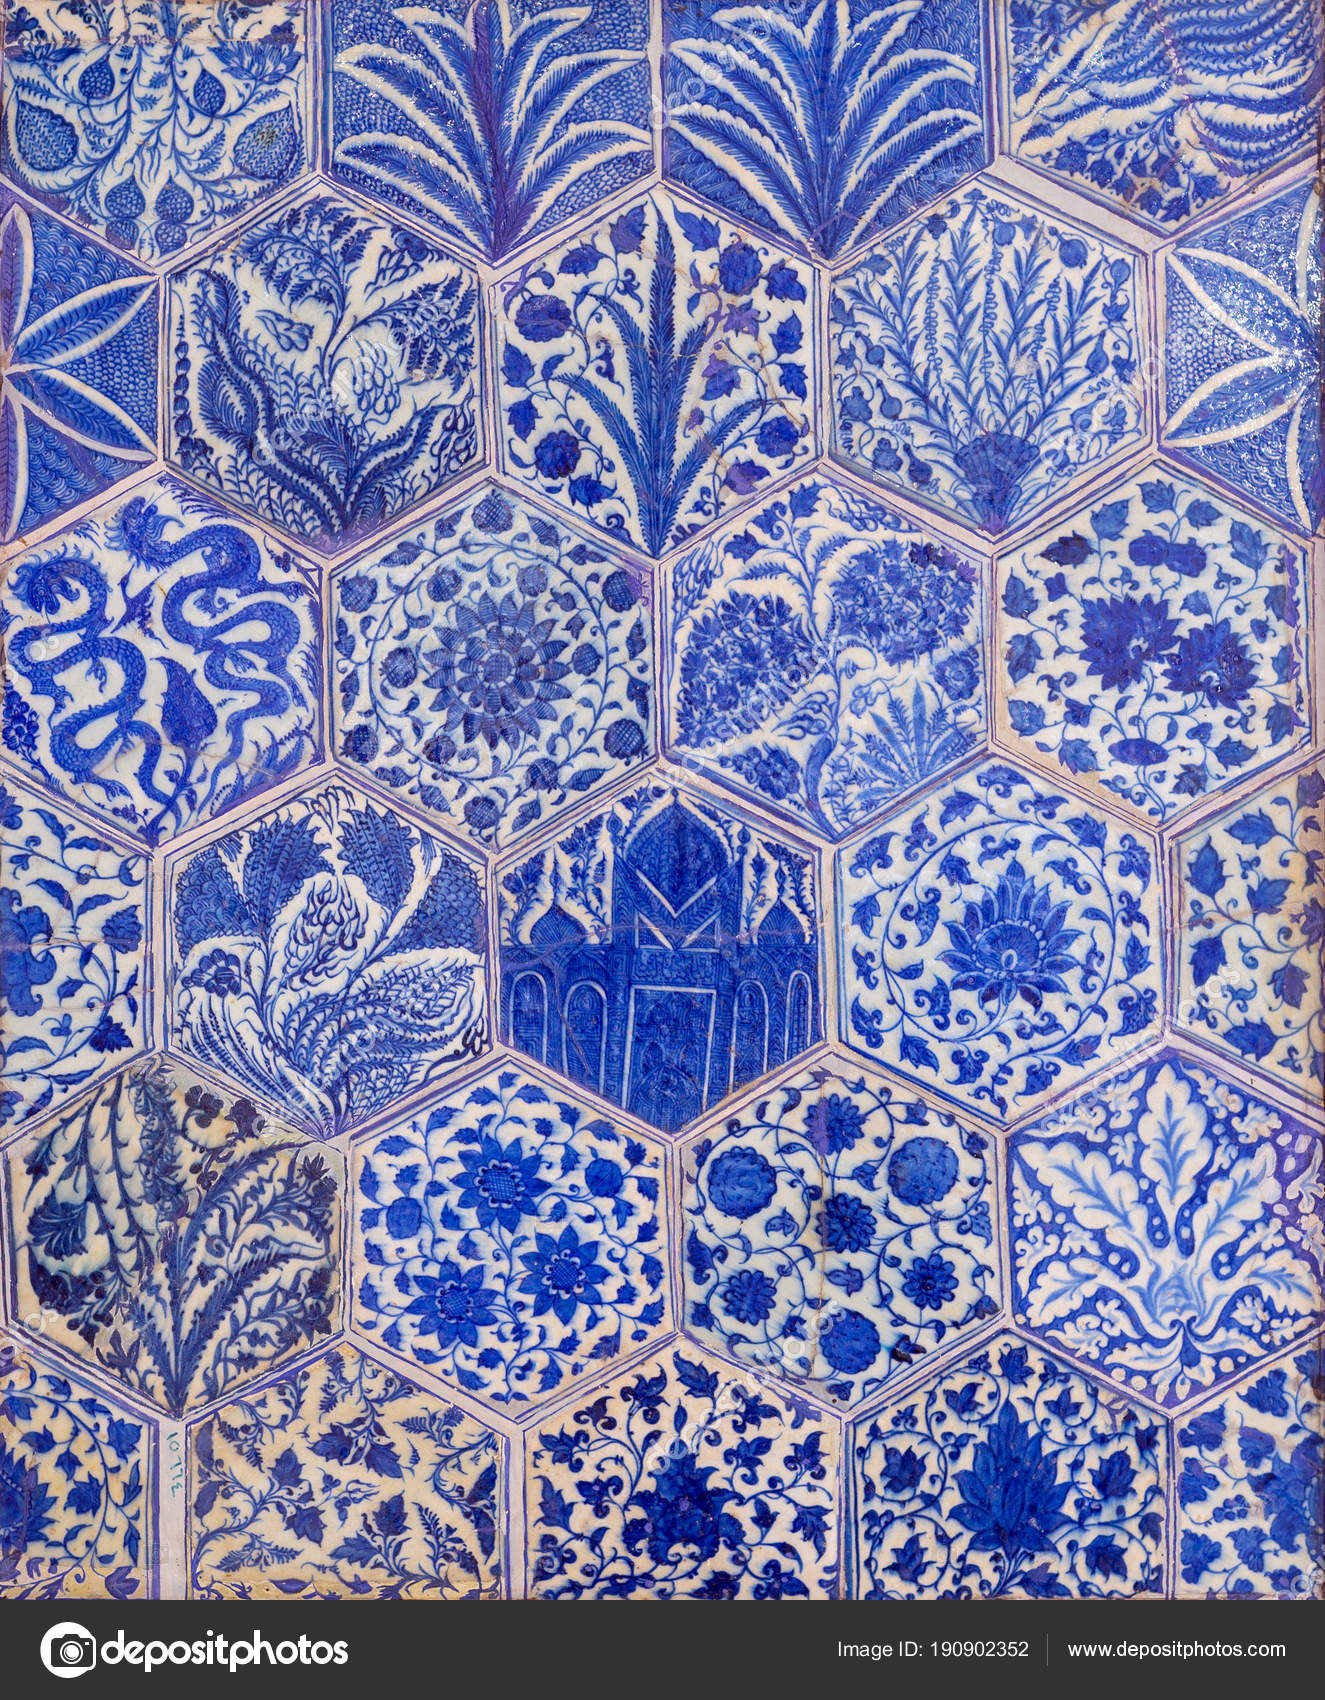 Piastrelle Di Ceramica Decorate.Stile Di Epoca Ottomana Smaltato Piastrelle Di Ceramica